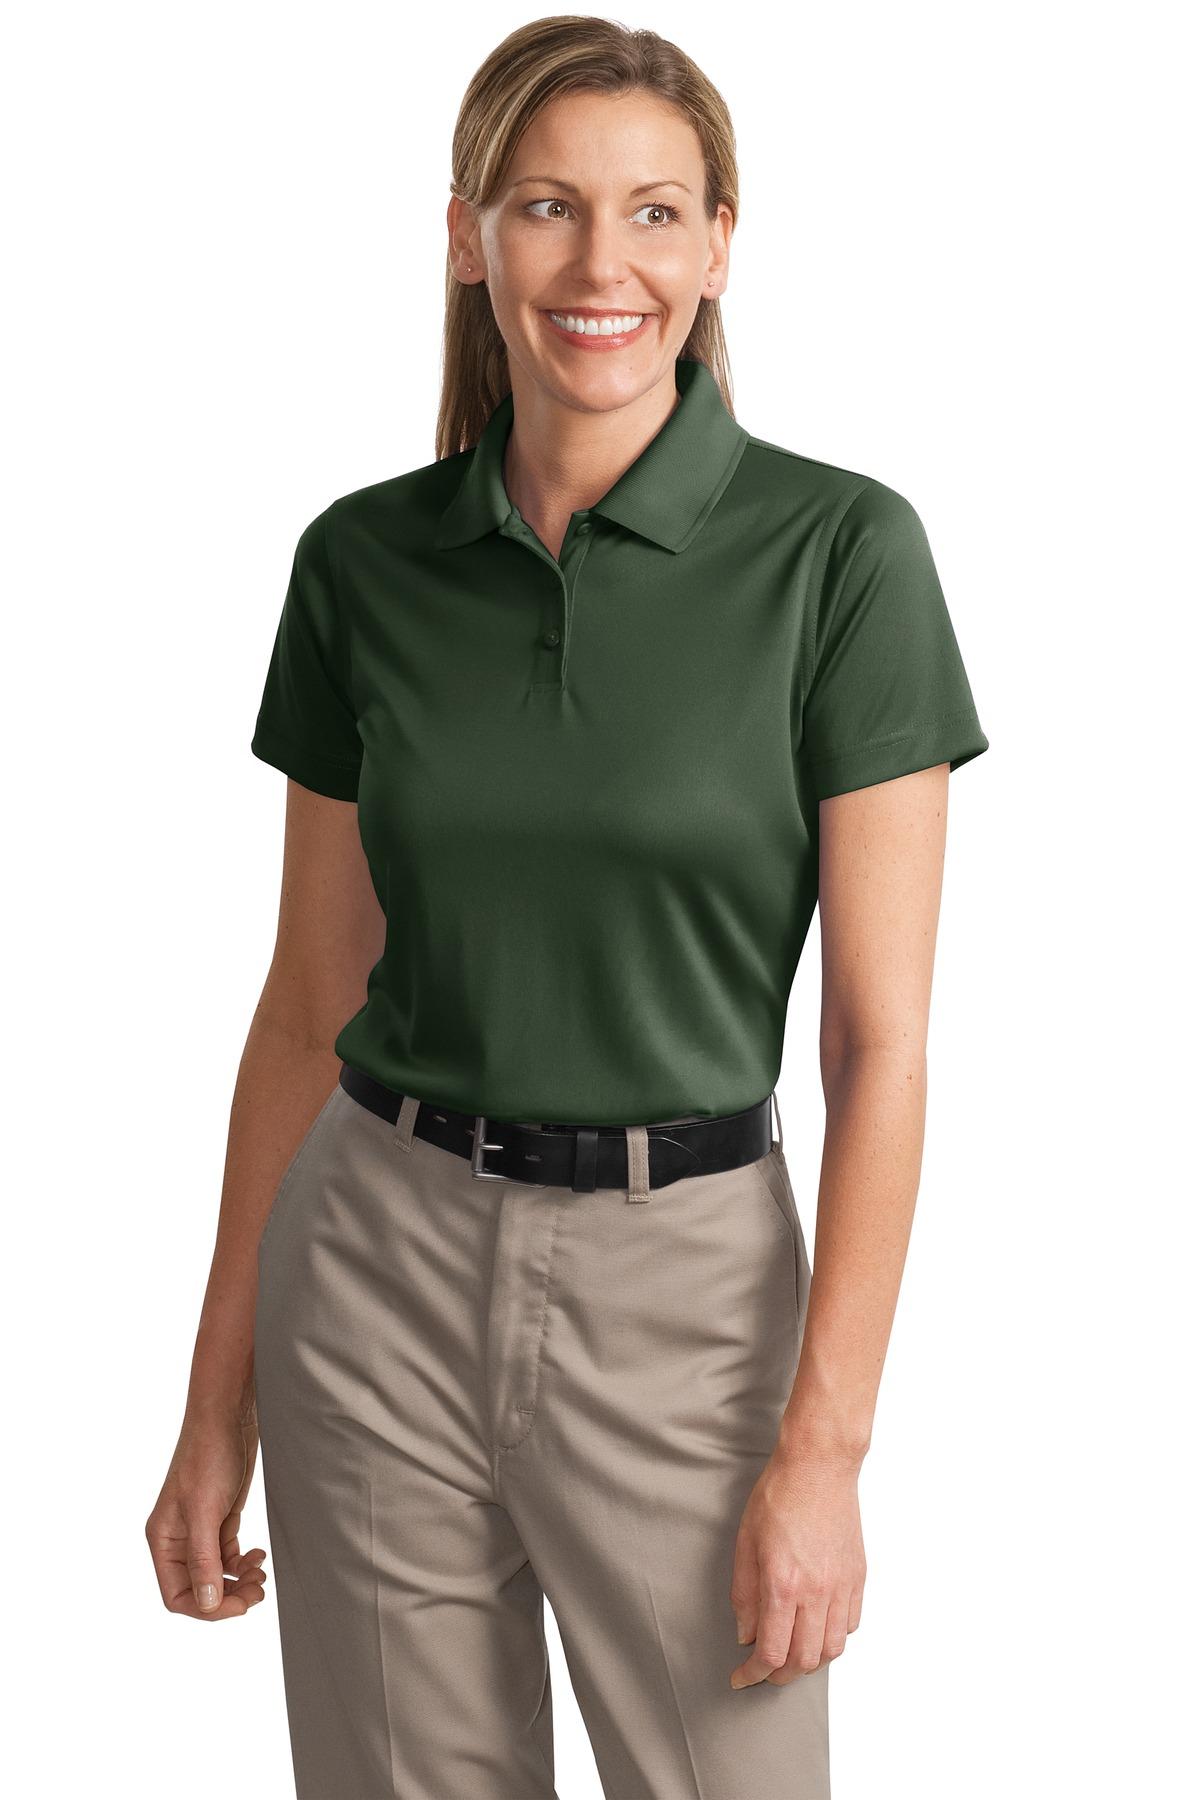 CornerStone® - Ladies Select Snag-Proof Polo.-CornerStone